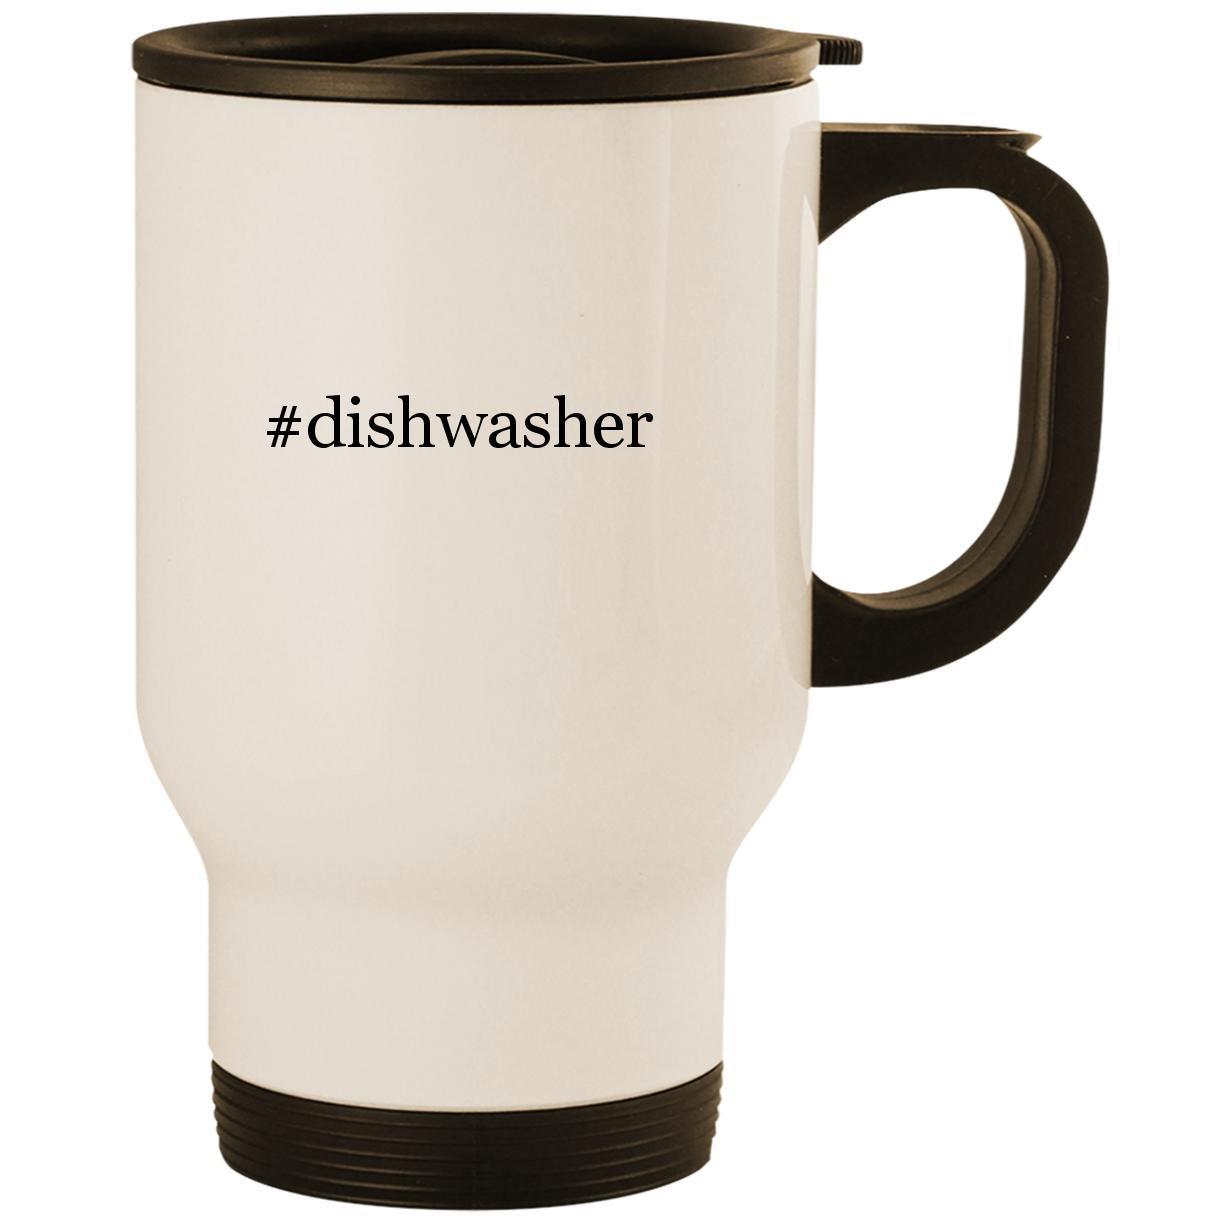 #dishwasher - Stainless Steel 14oz Road Ready Travel Mug, White